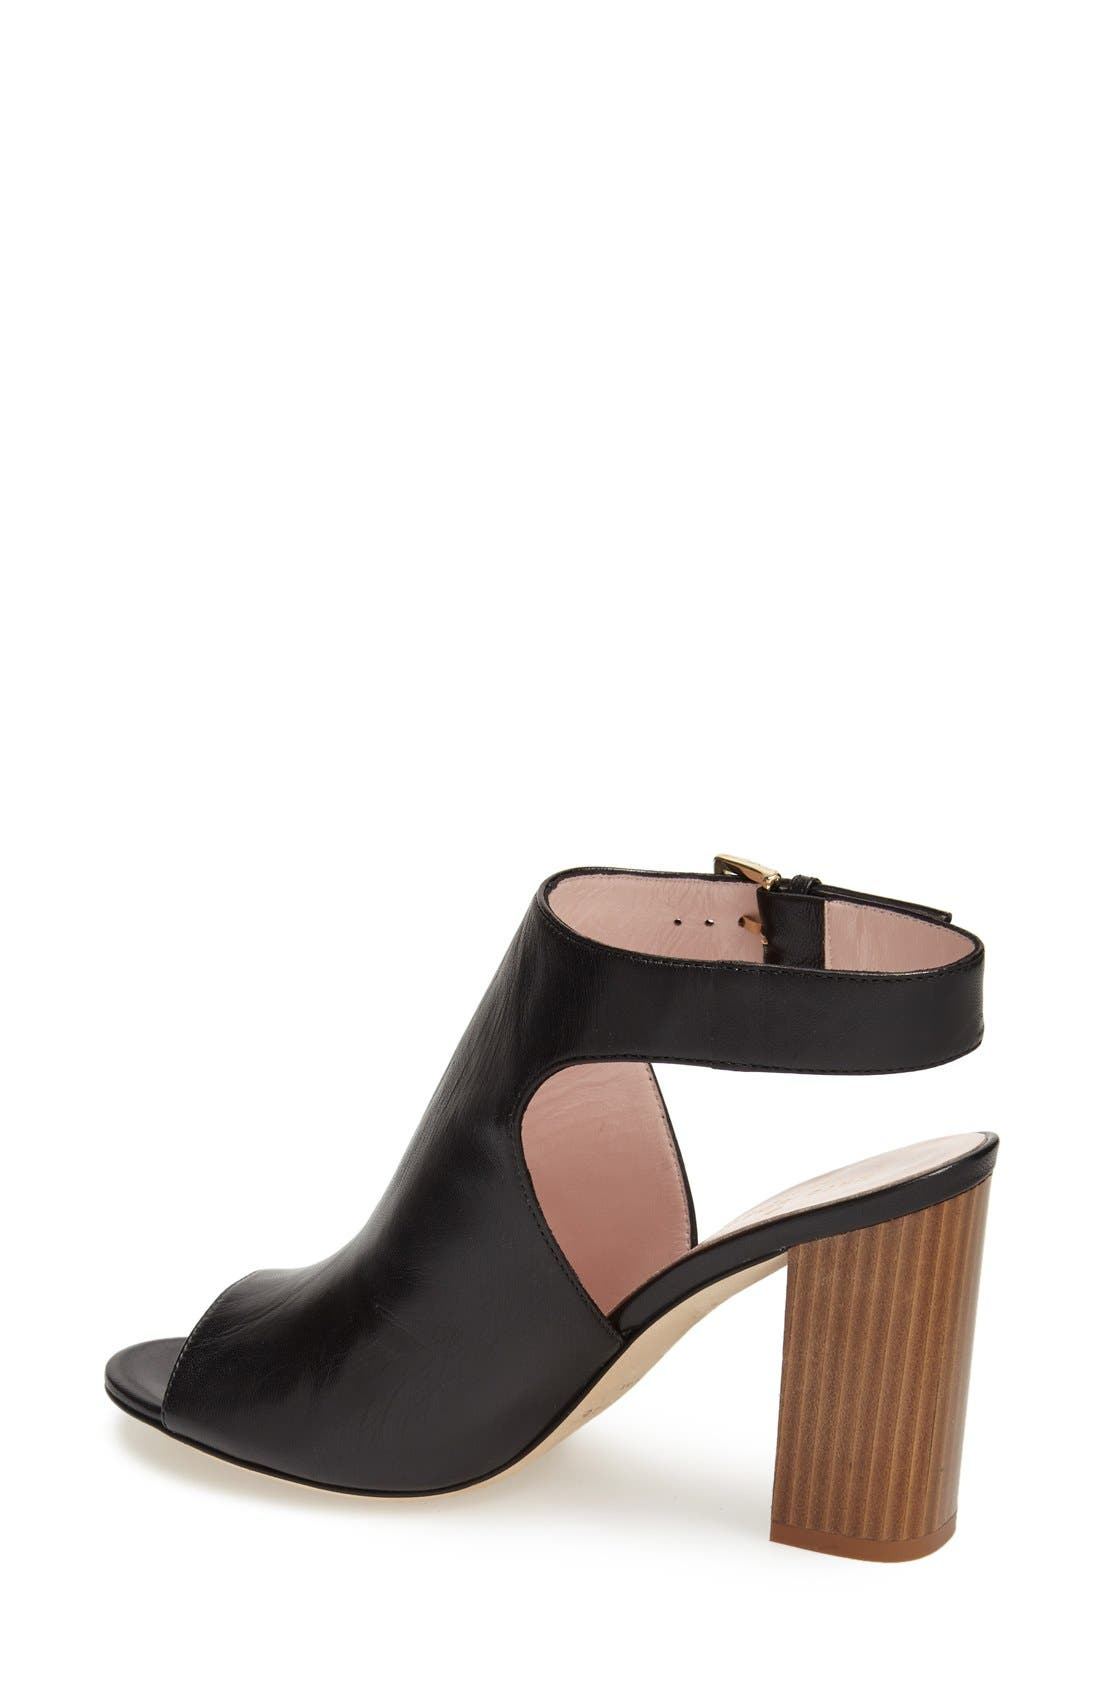 Alternate Image 2  - kate spade new york 'ingrada' slingback sandal (Women)